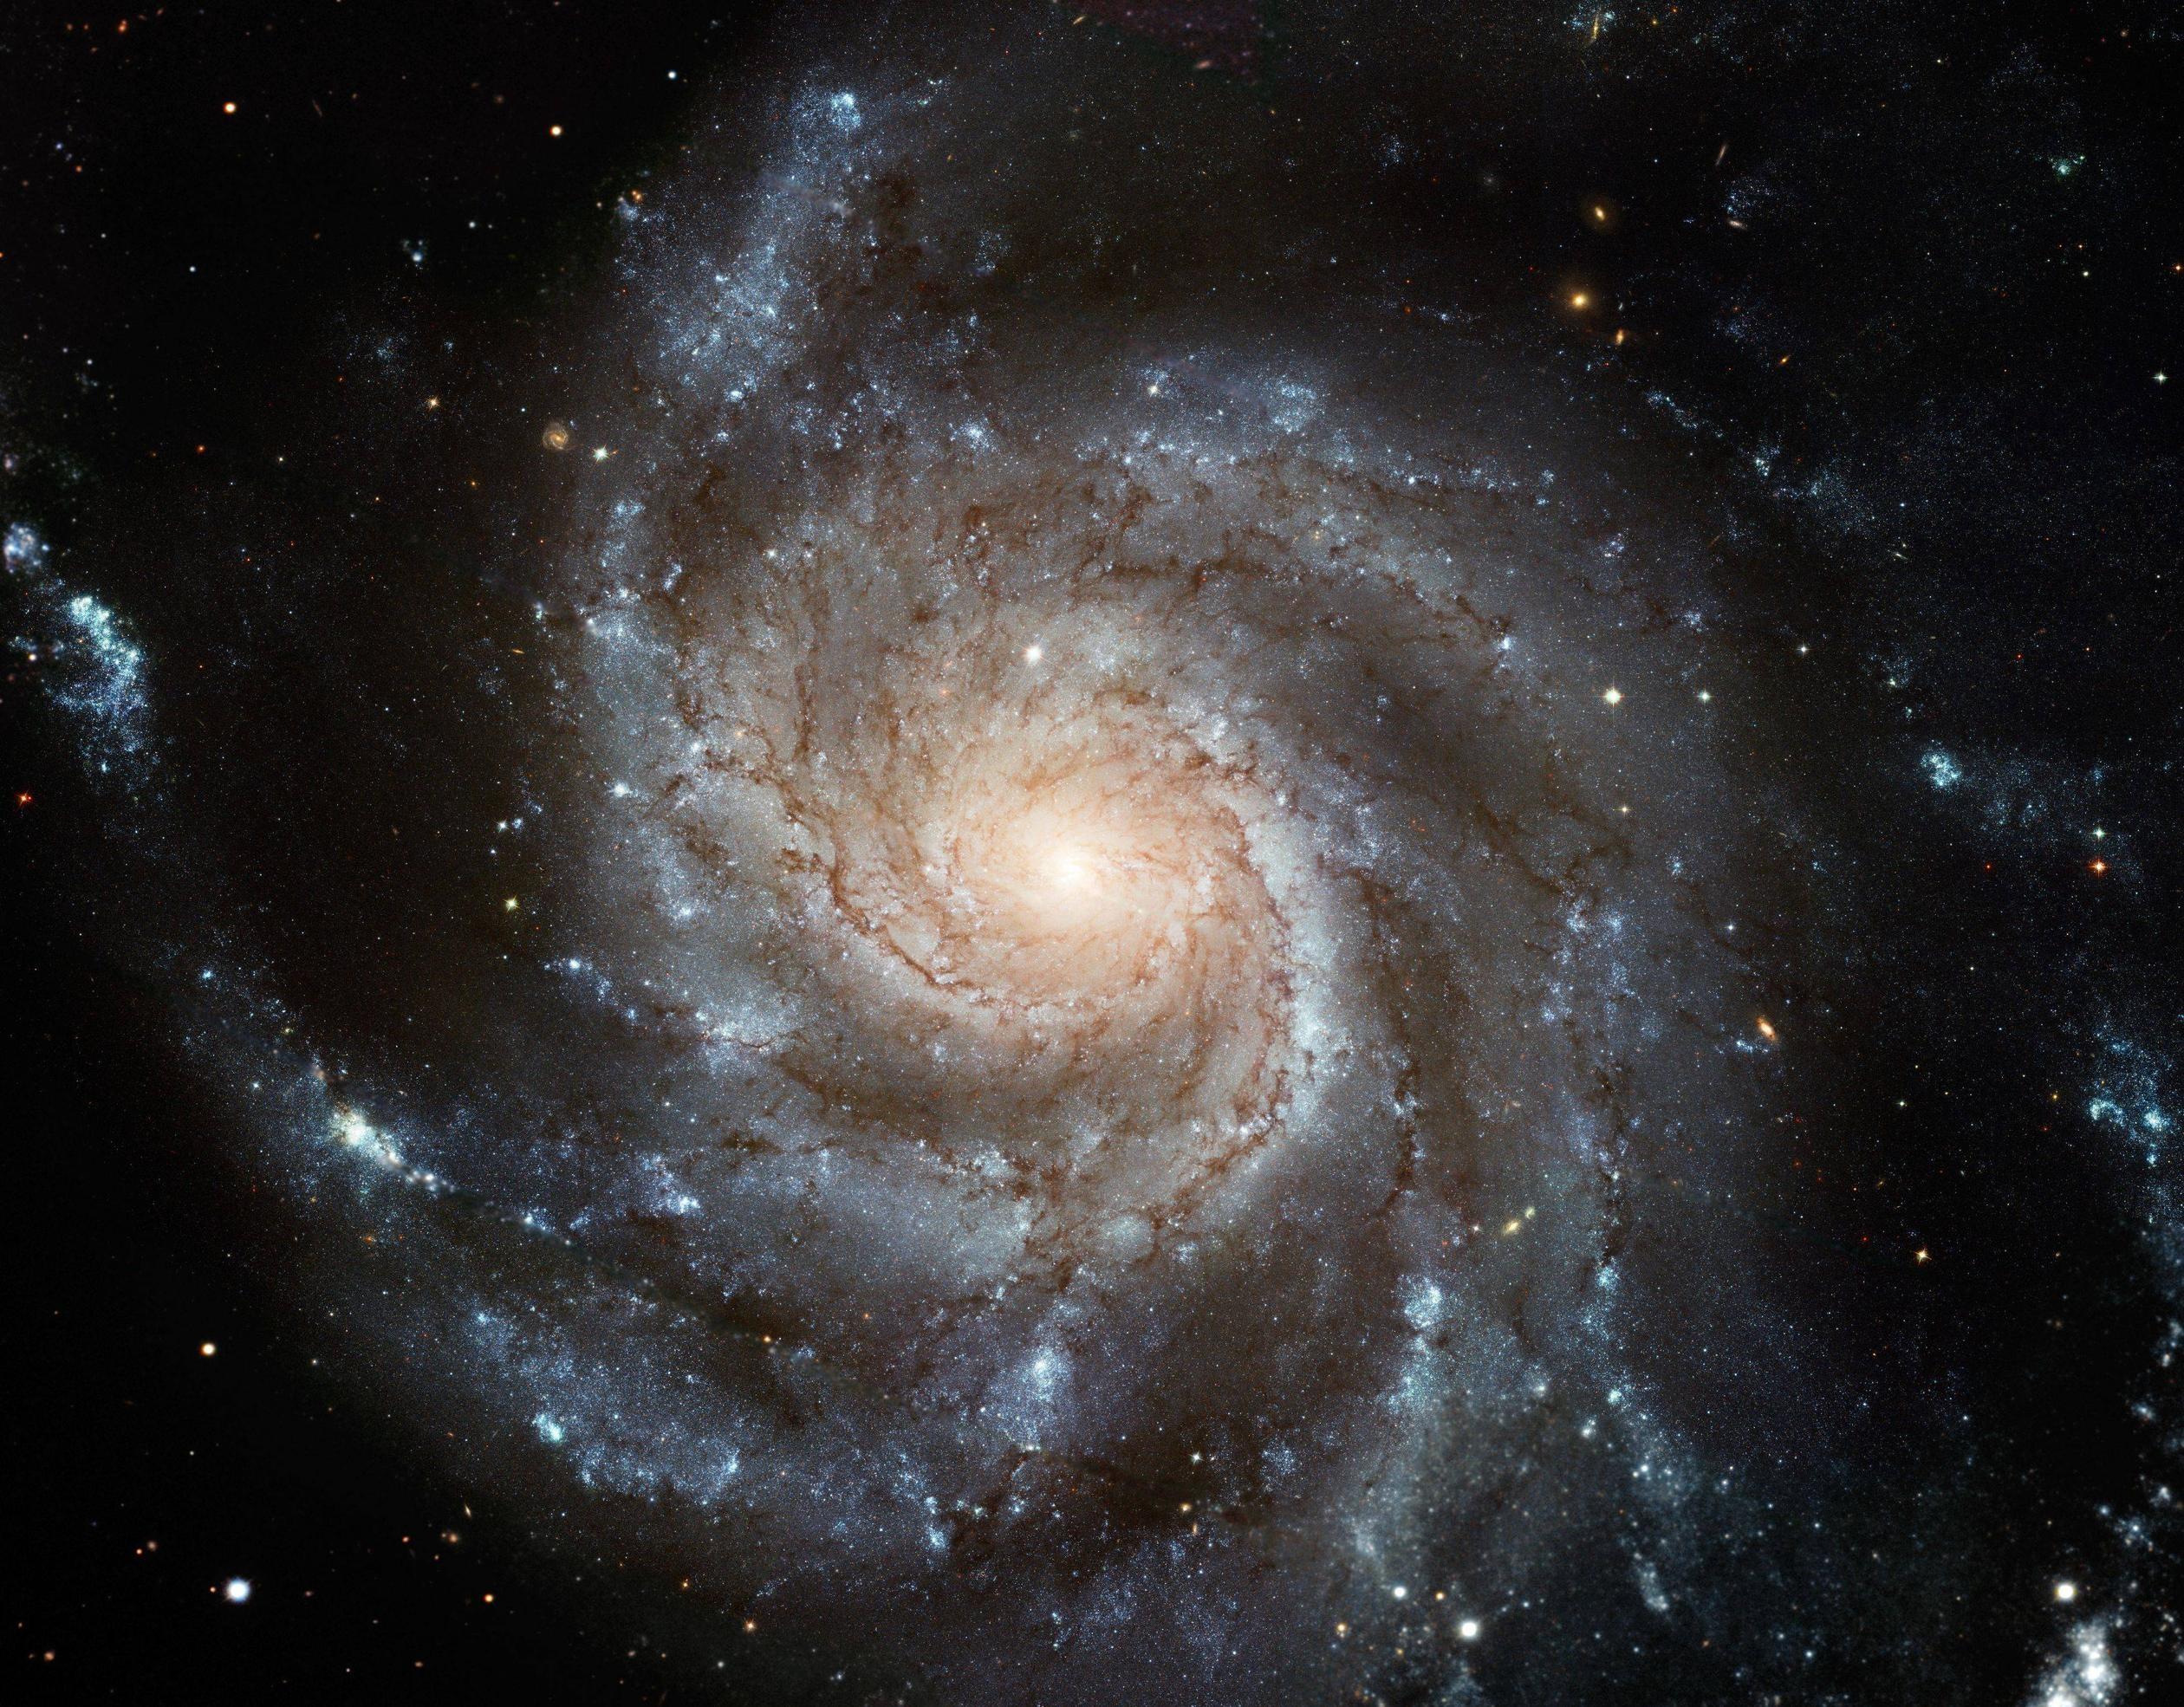 High Res Galaxy Wallpaper [6000×4690] …